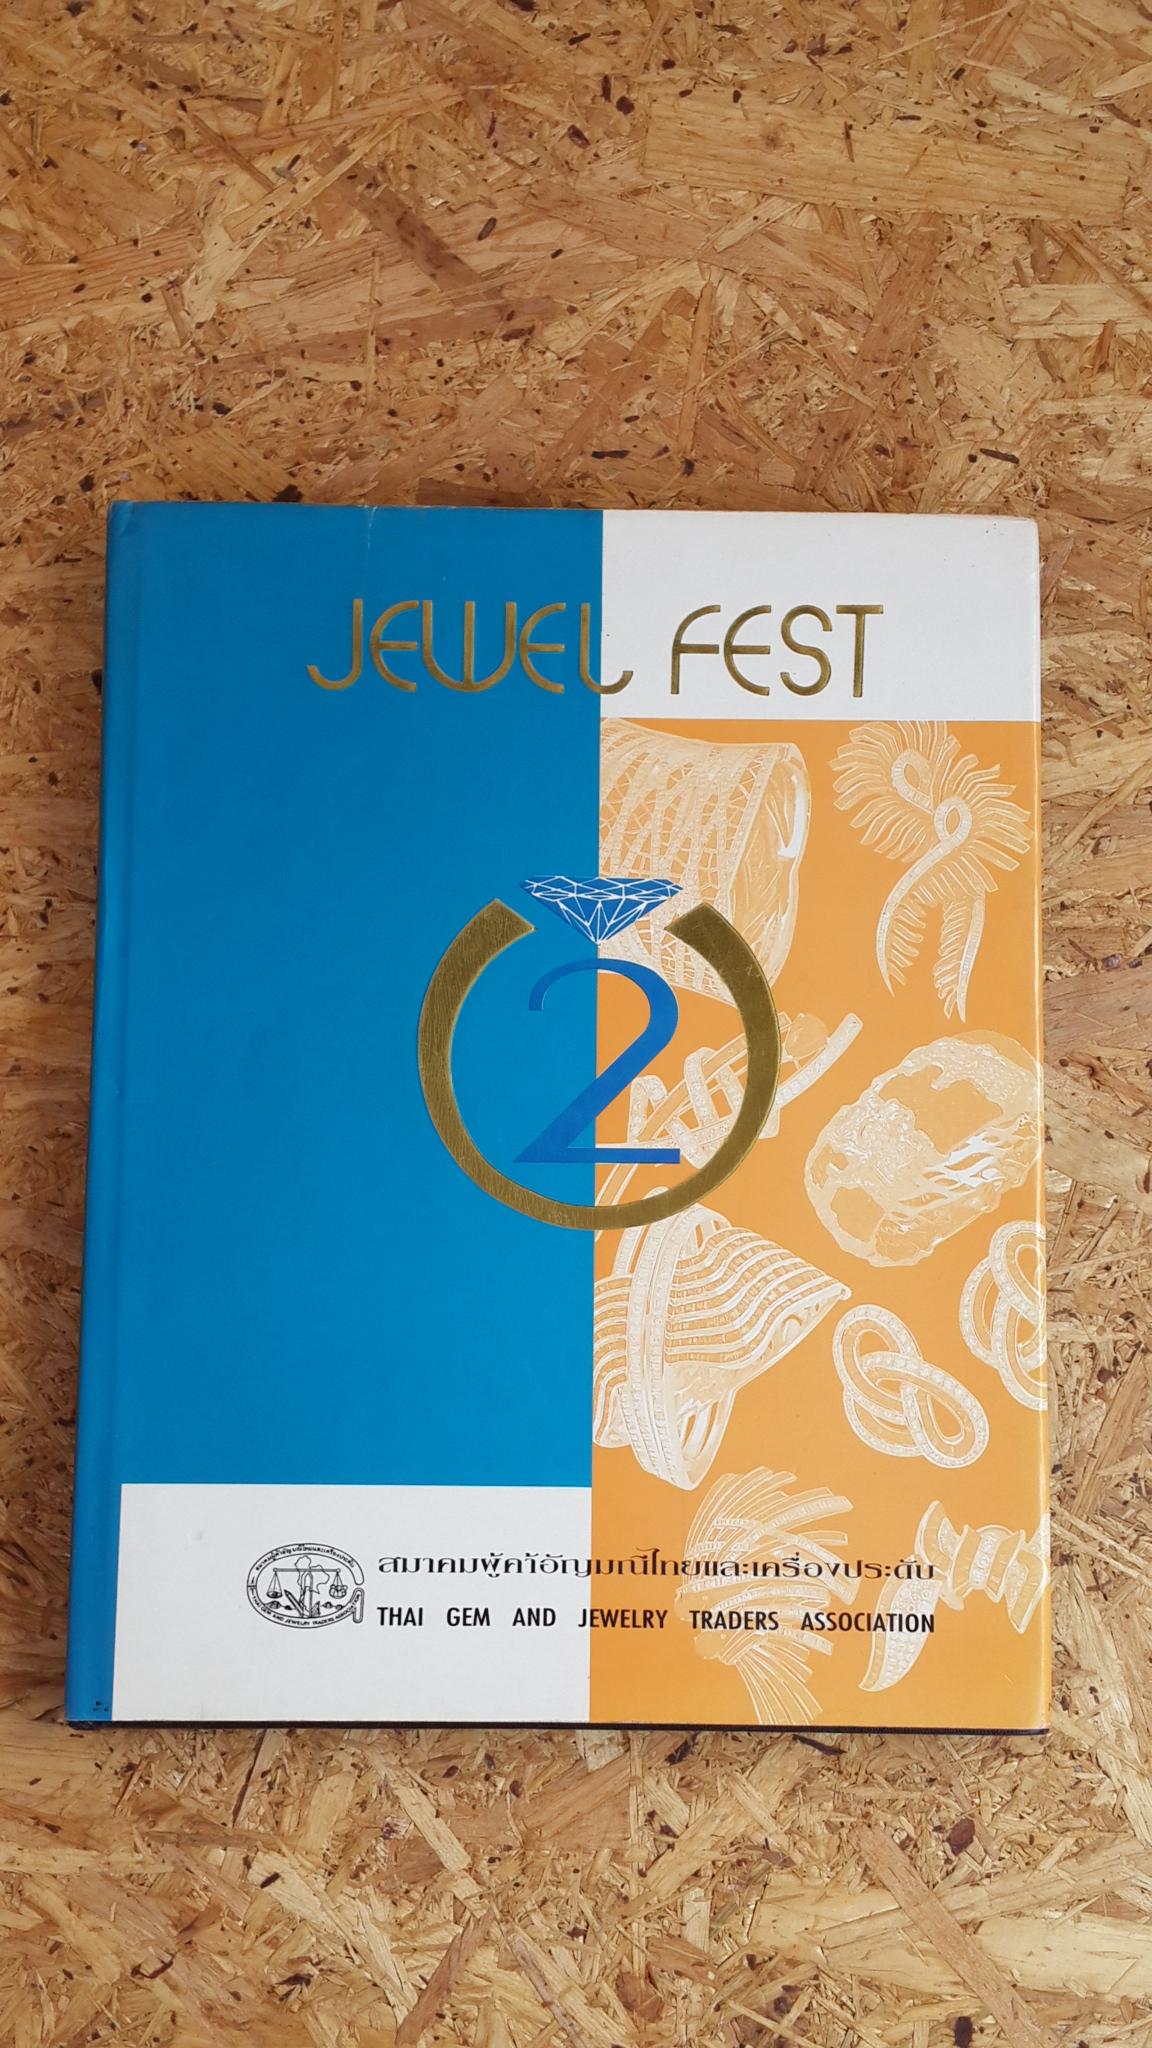 JEWEL FEST 2 / สมาคมผู้ค้าอัญมณีไทยและเครื่องประดับ